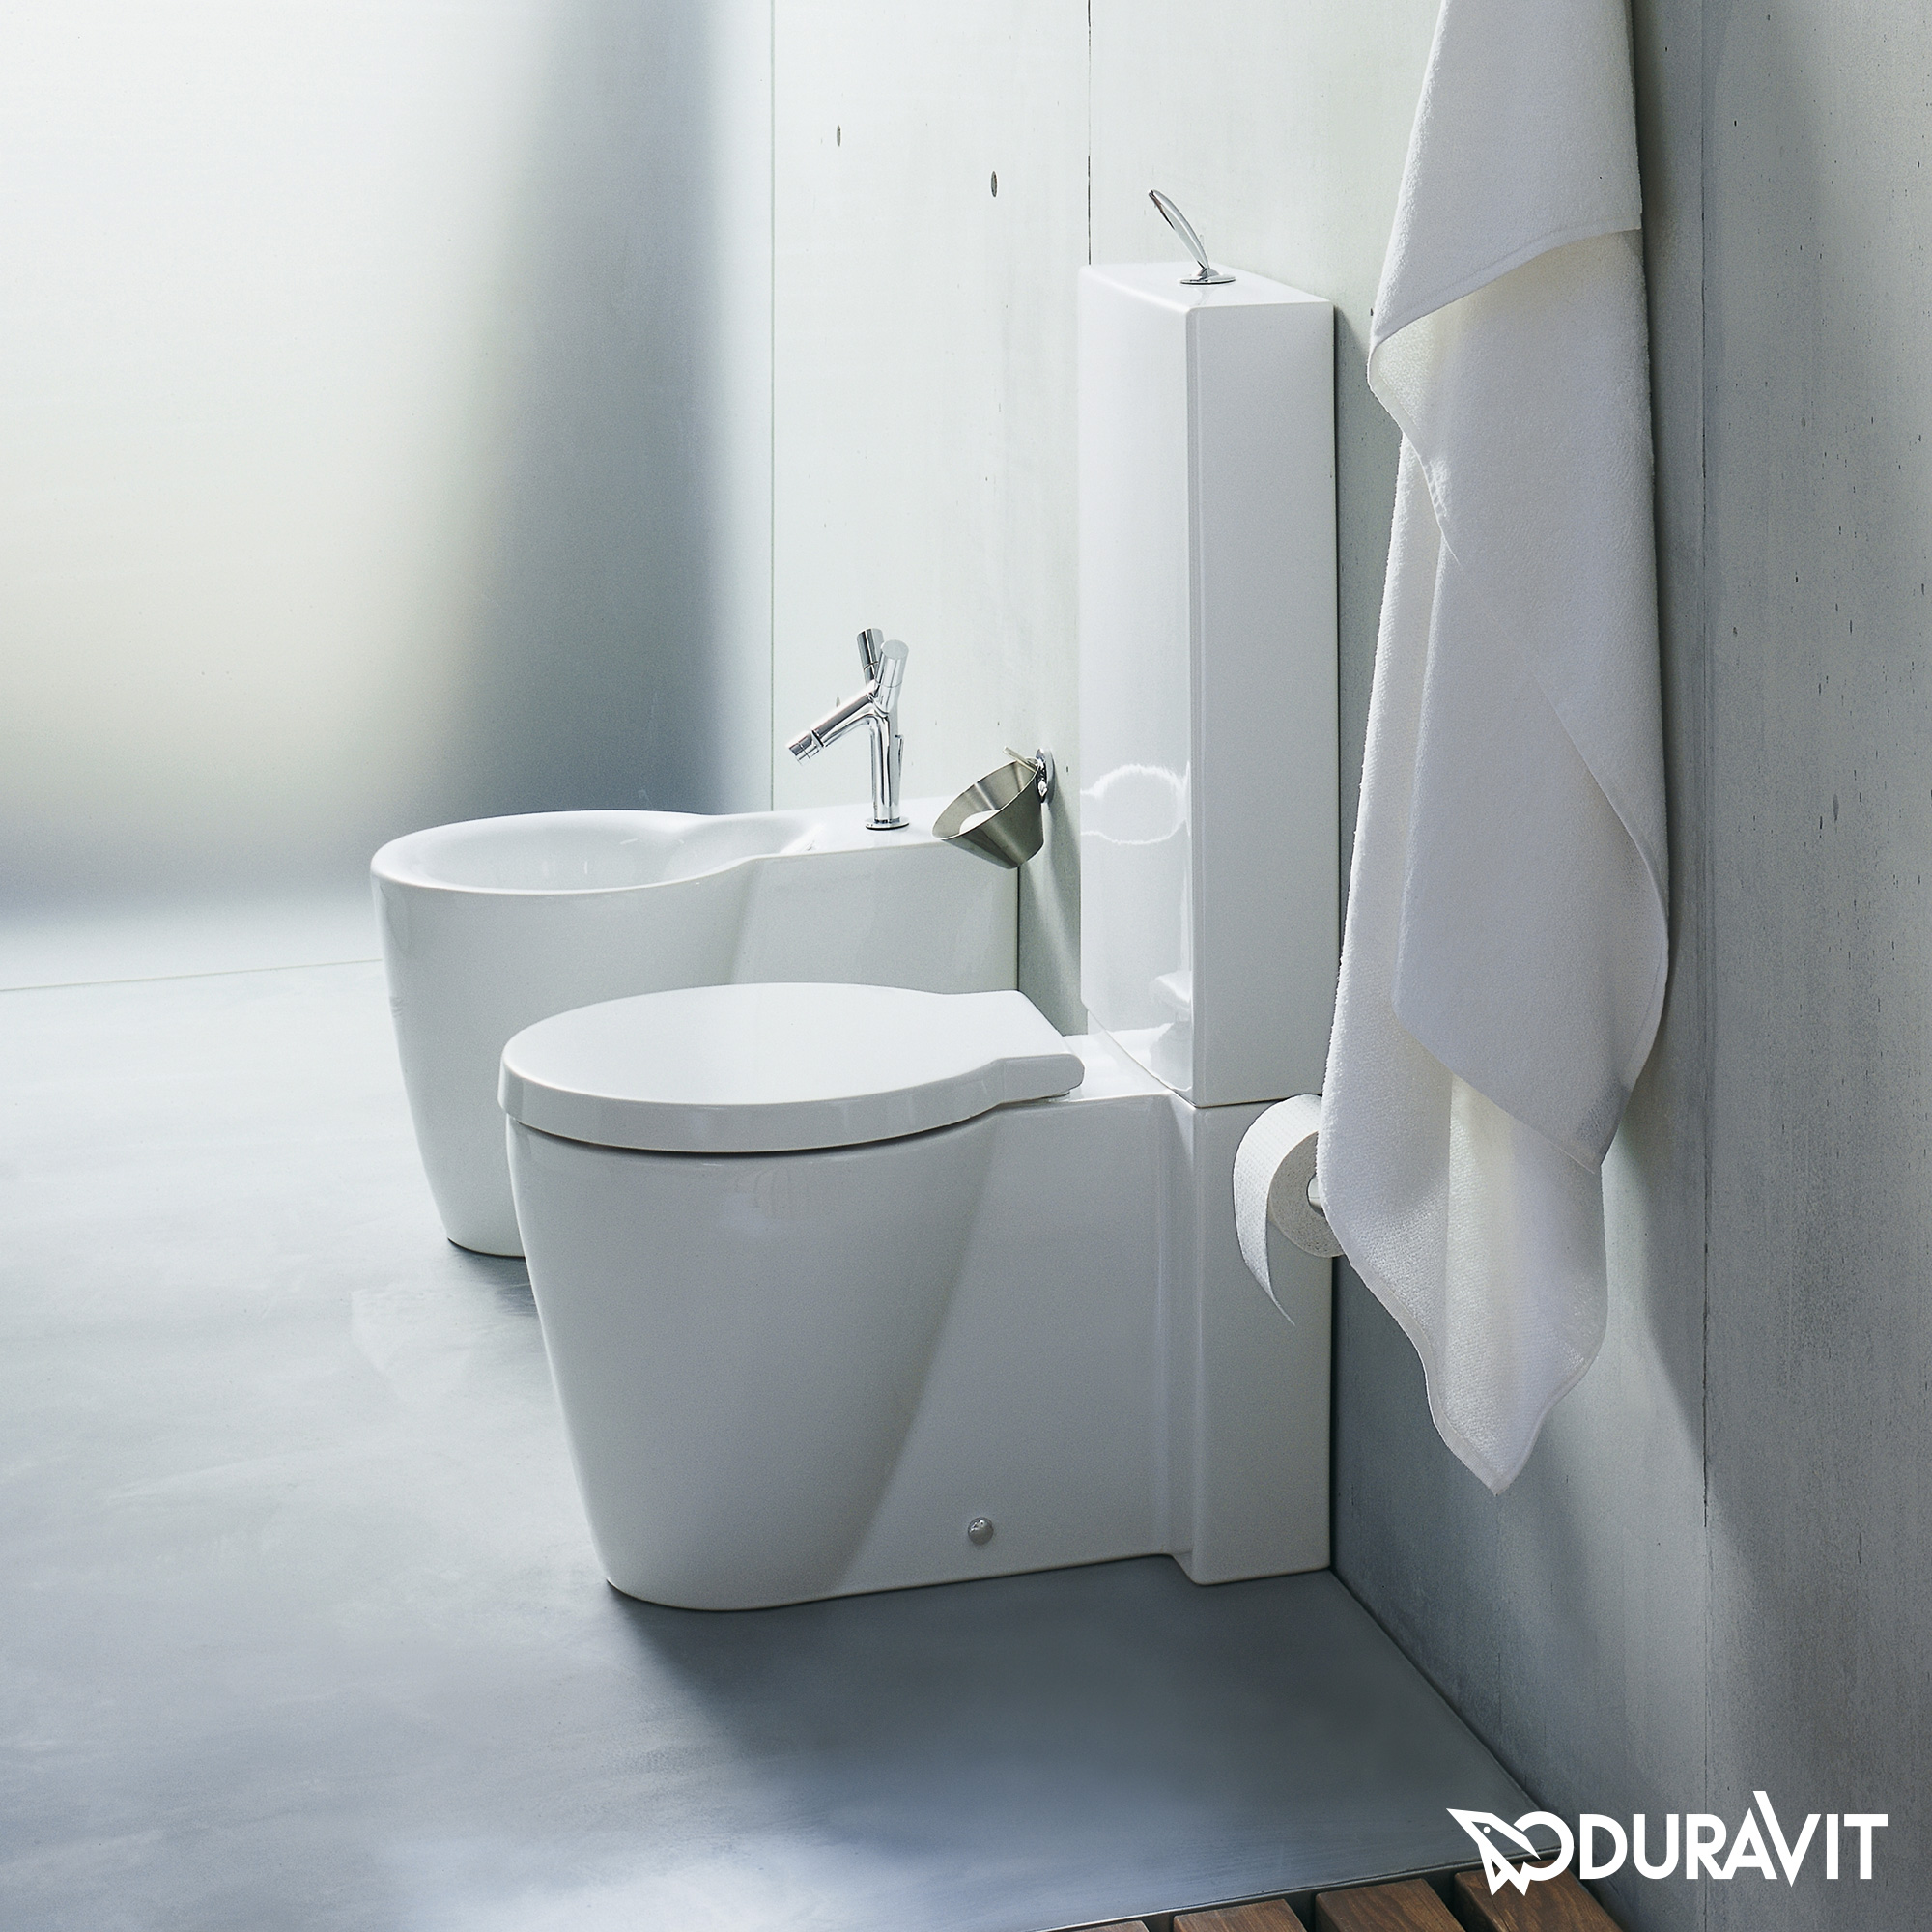 duravit starck 1 stand tiefsp l wc f r kombination l 64 b 41 5 cm wei wondergliss. Black Bedroom Furniture Sets. Home Design Ideas